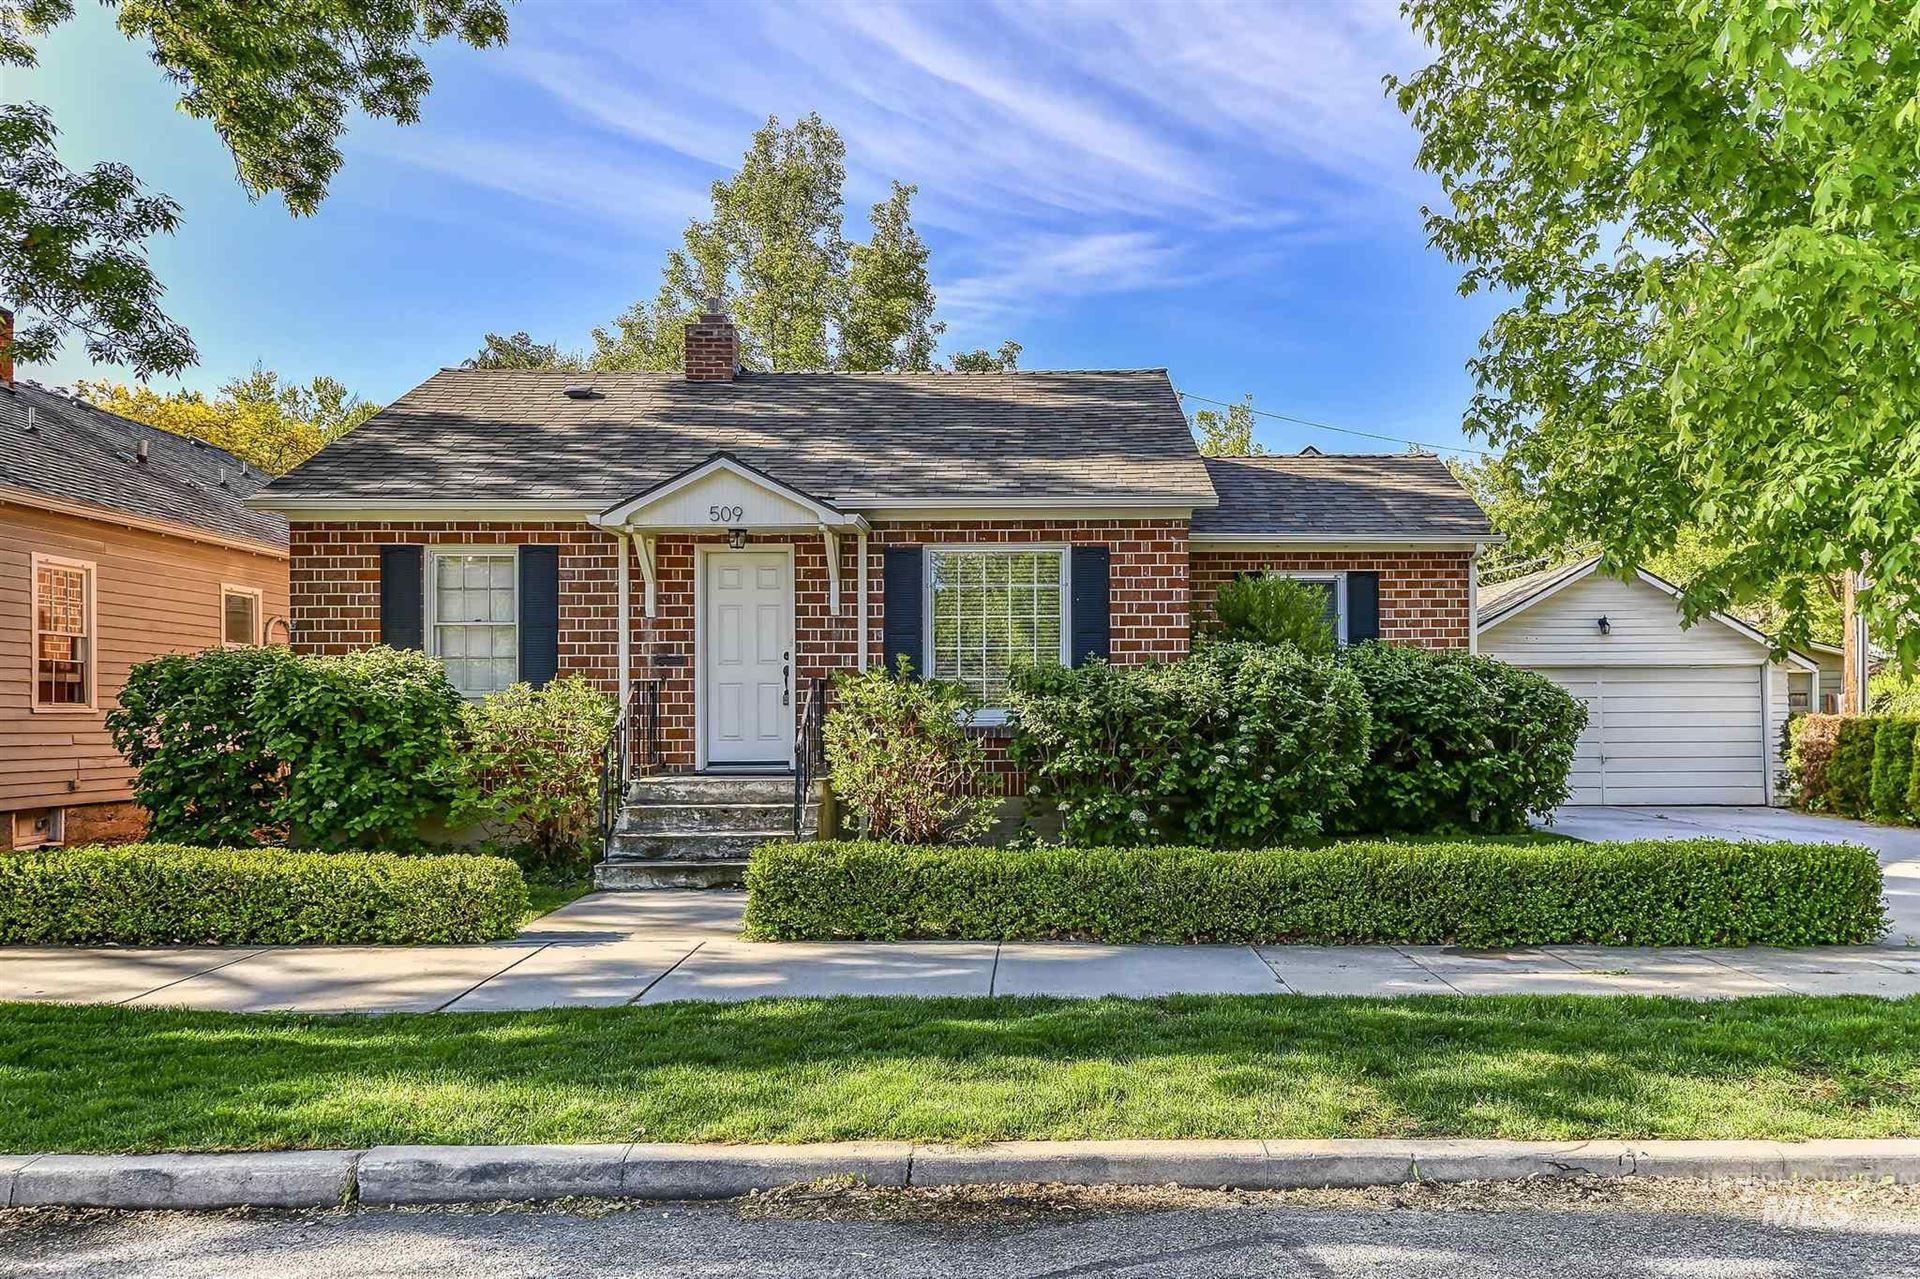 Photo of 509 W Thatcher, Boise, ID 83702 (MLS # 98803324)